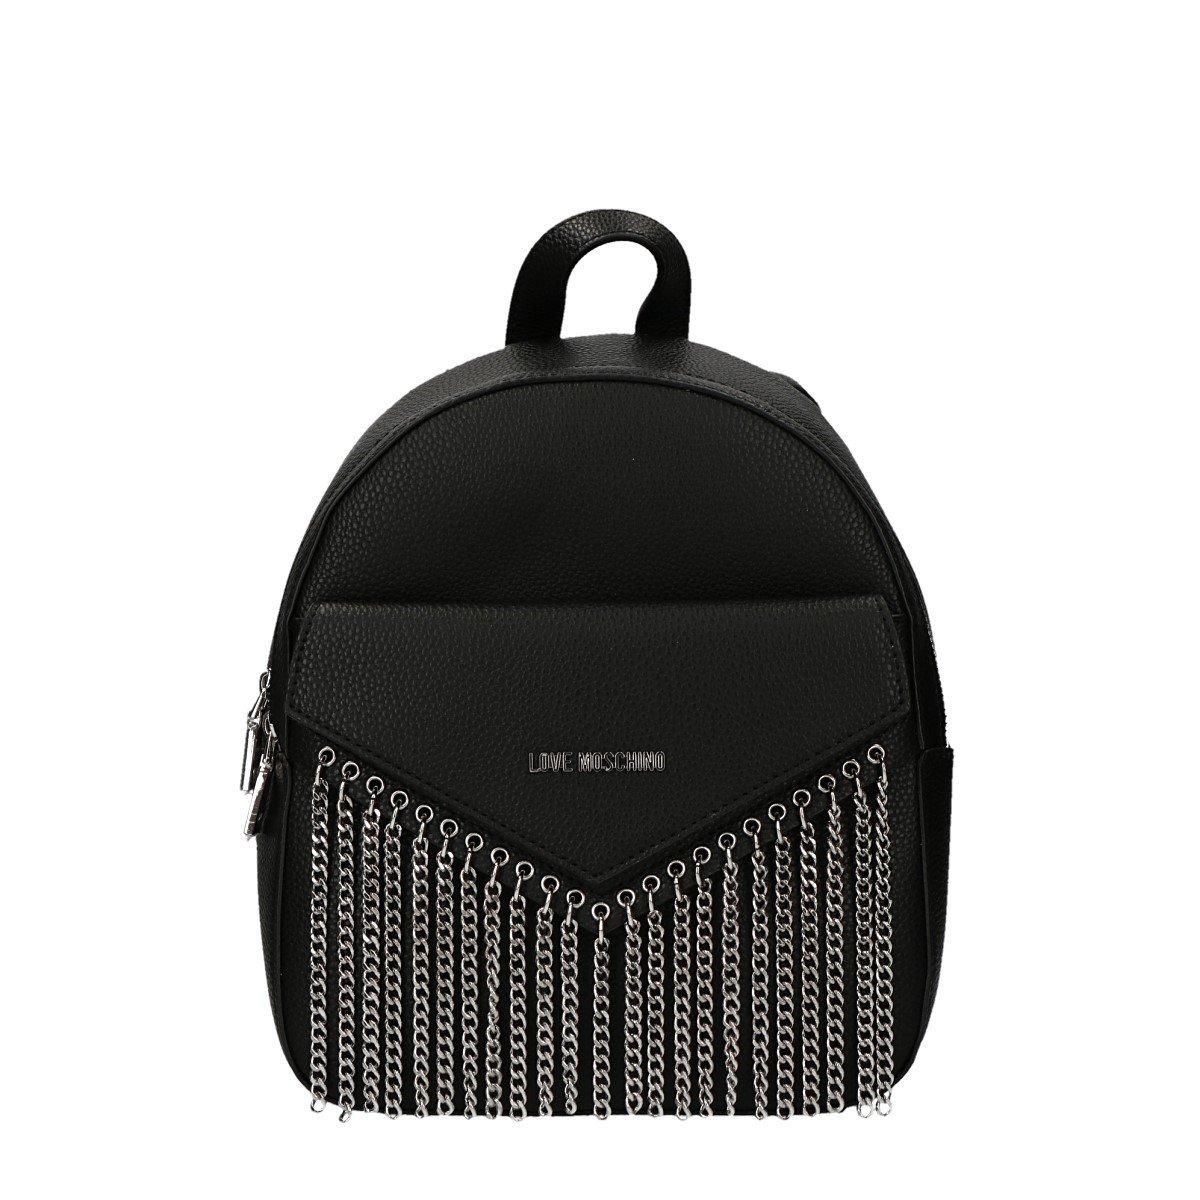 LOVE Moschino Women's Backpack Metal Chains Black Backpack